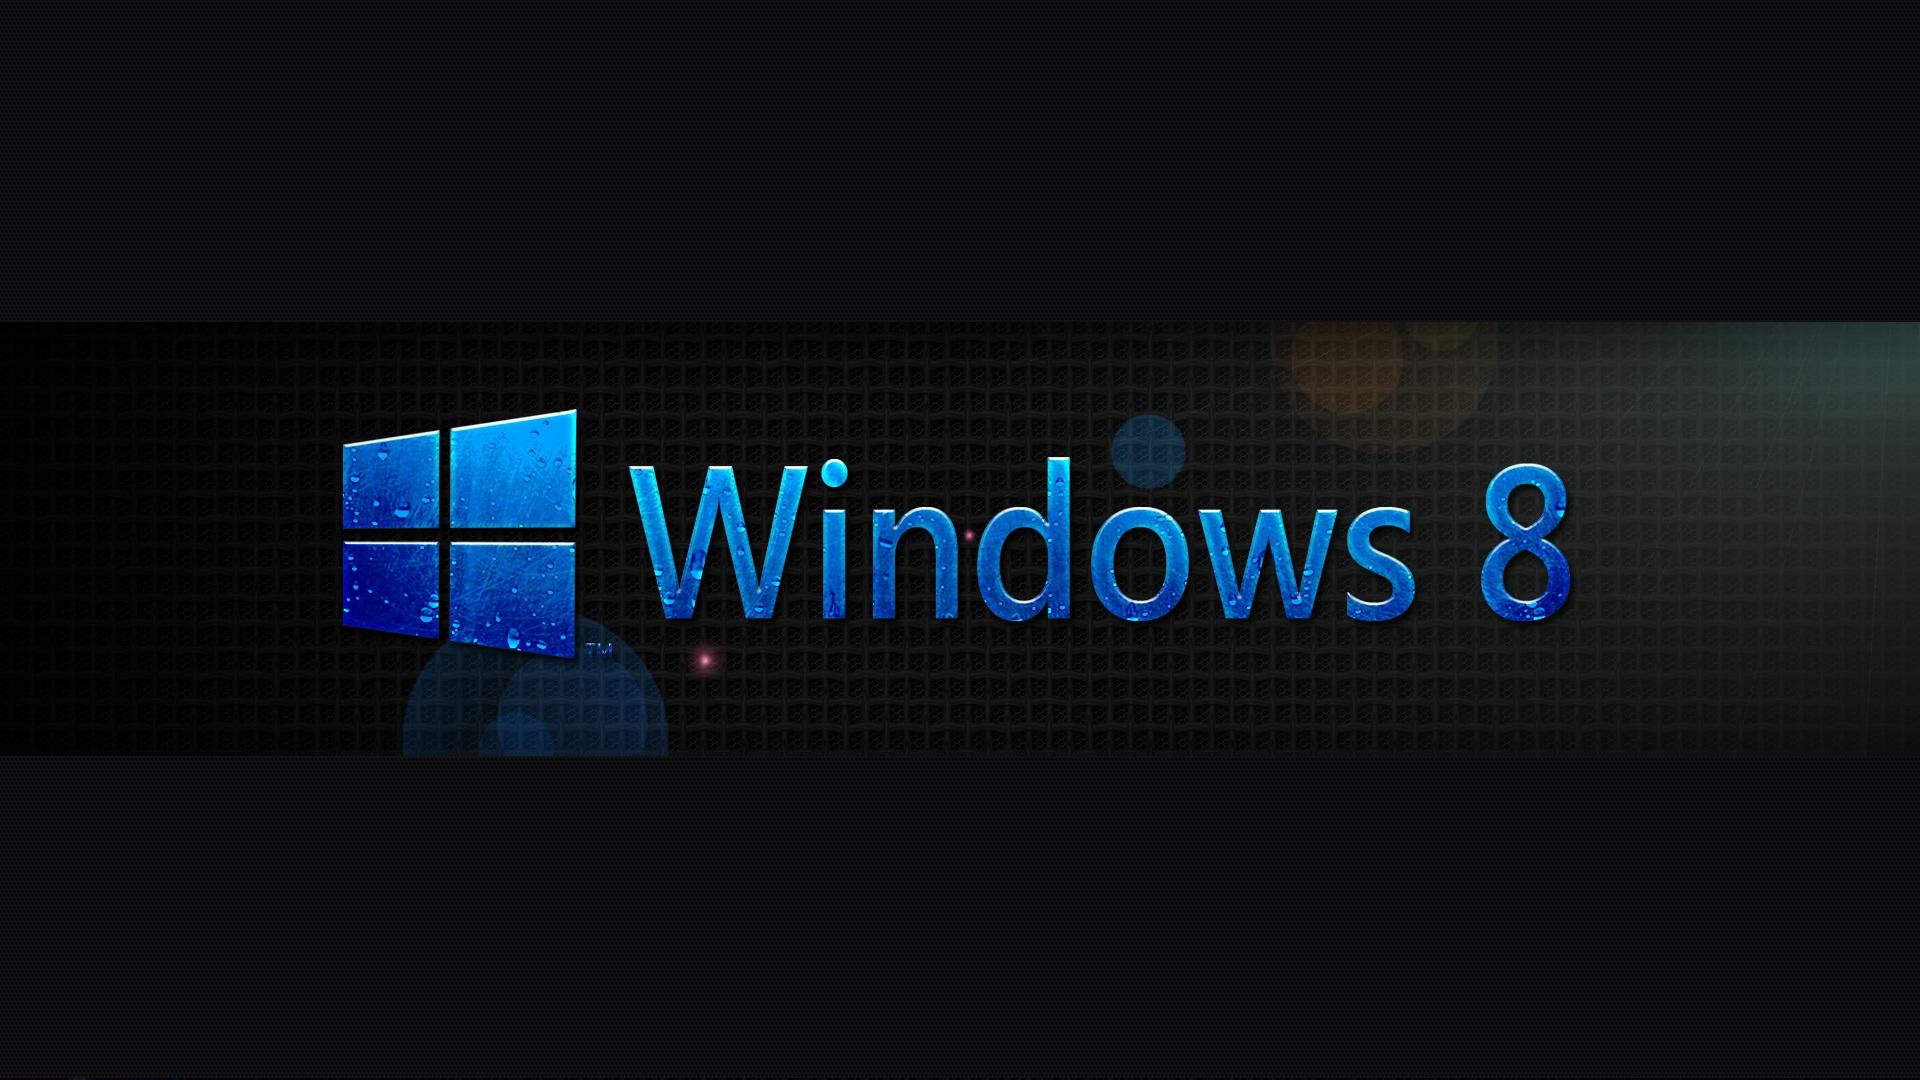 Windows 8 Black HD Wallpapers 6979861 1920x1080